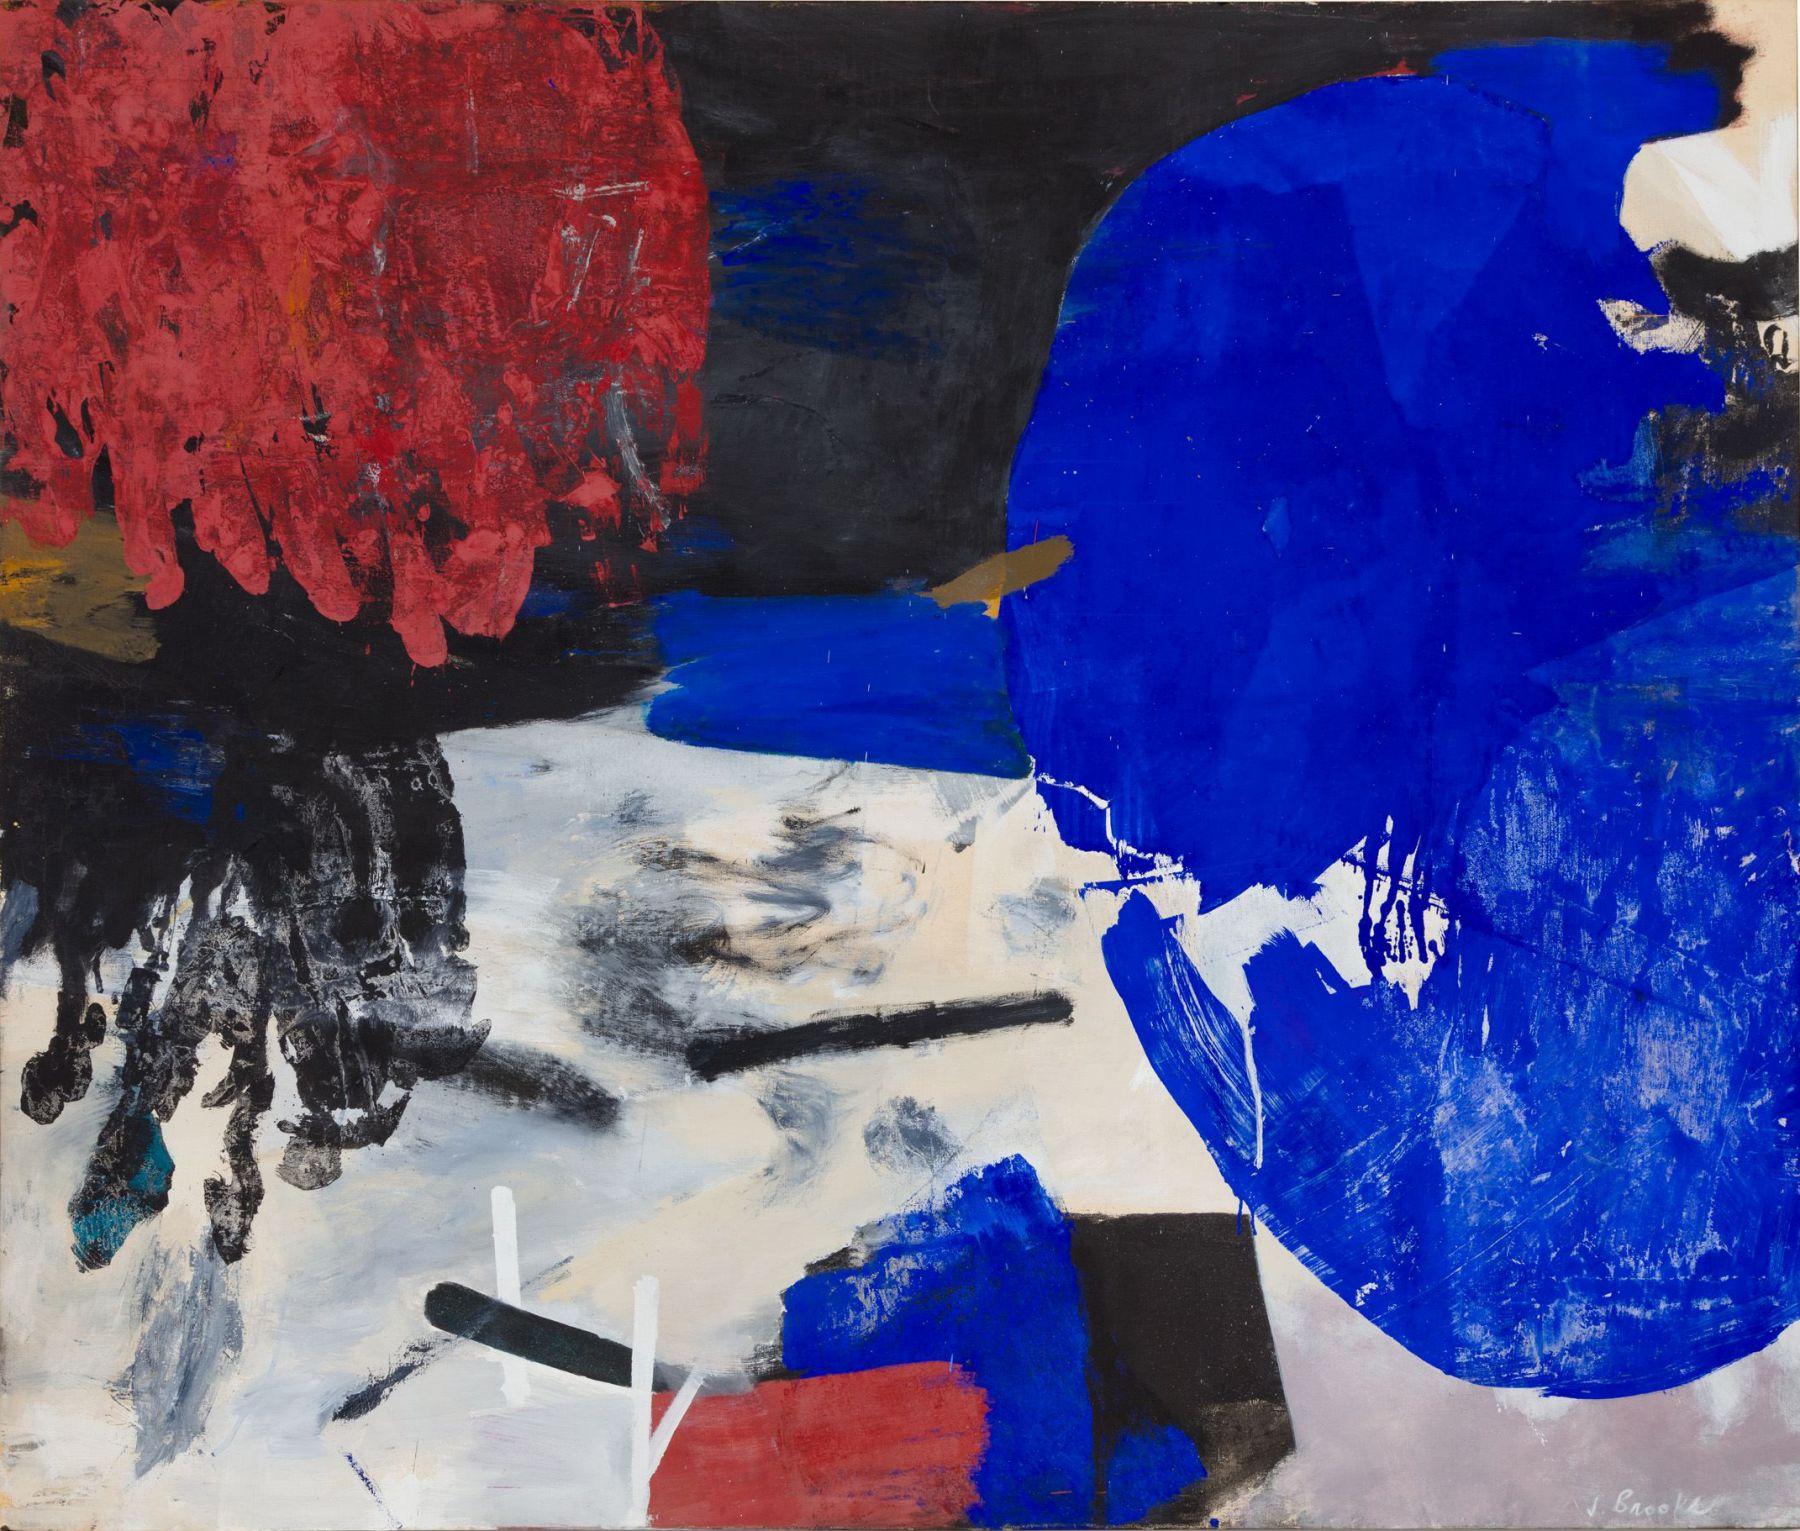 Sull,1961 Oil on canvas